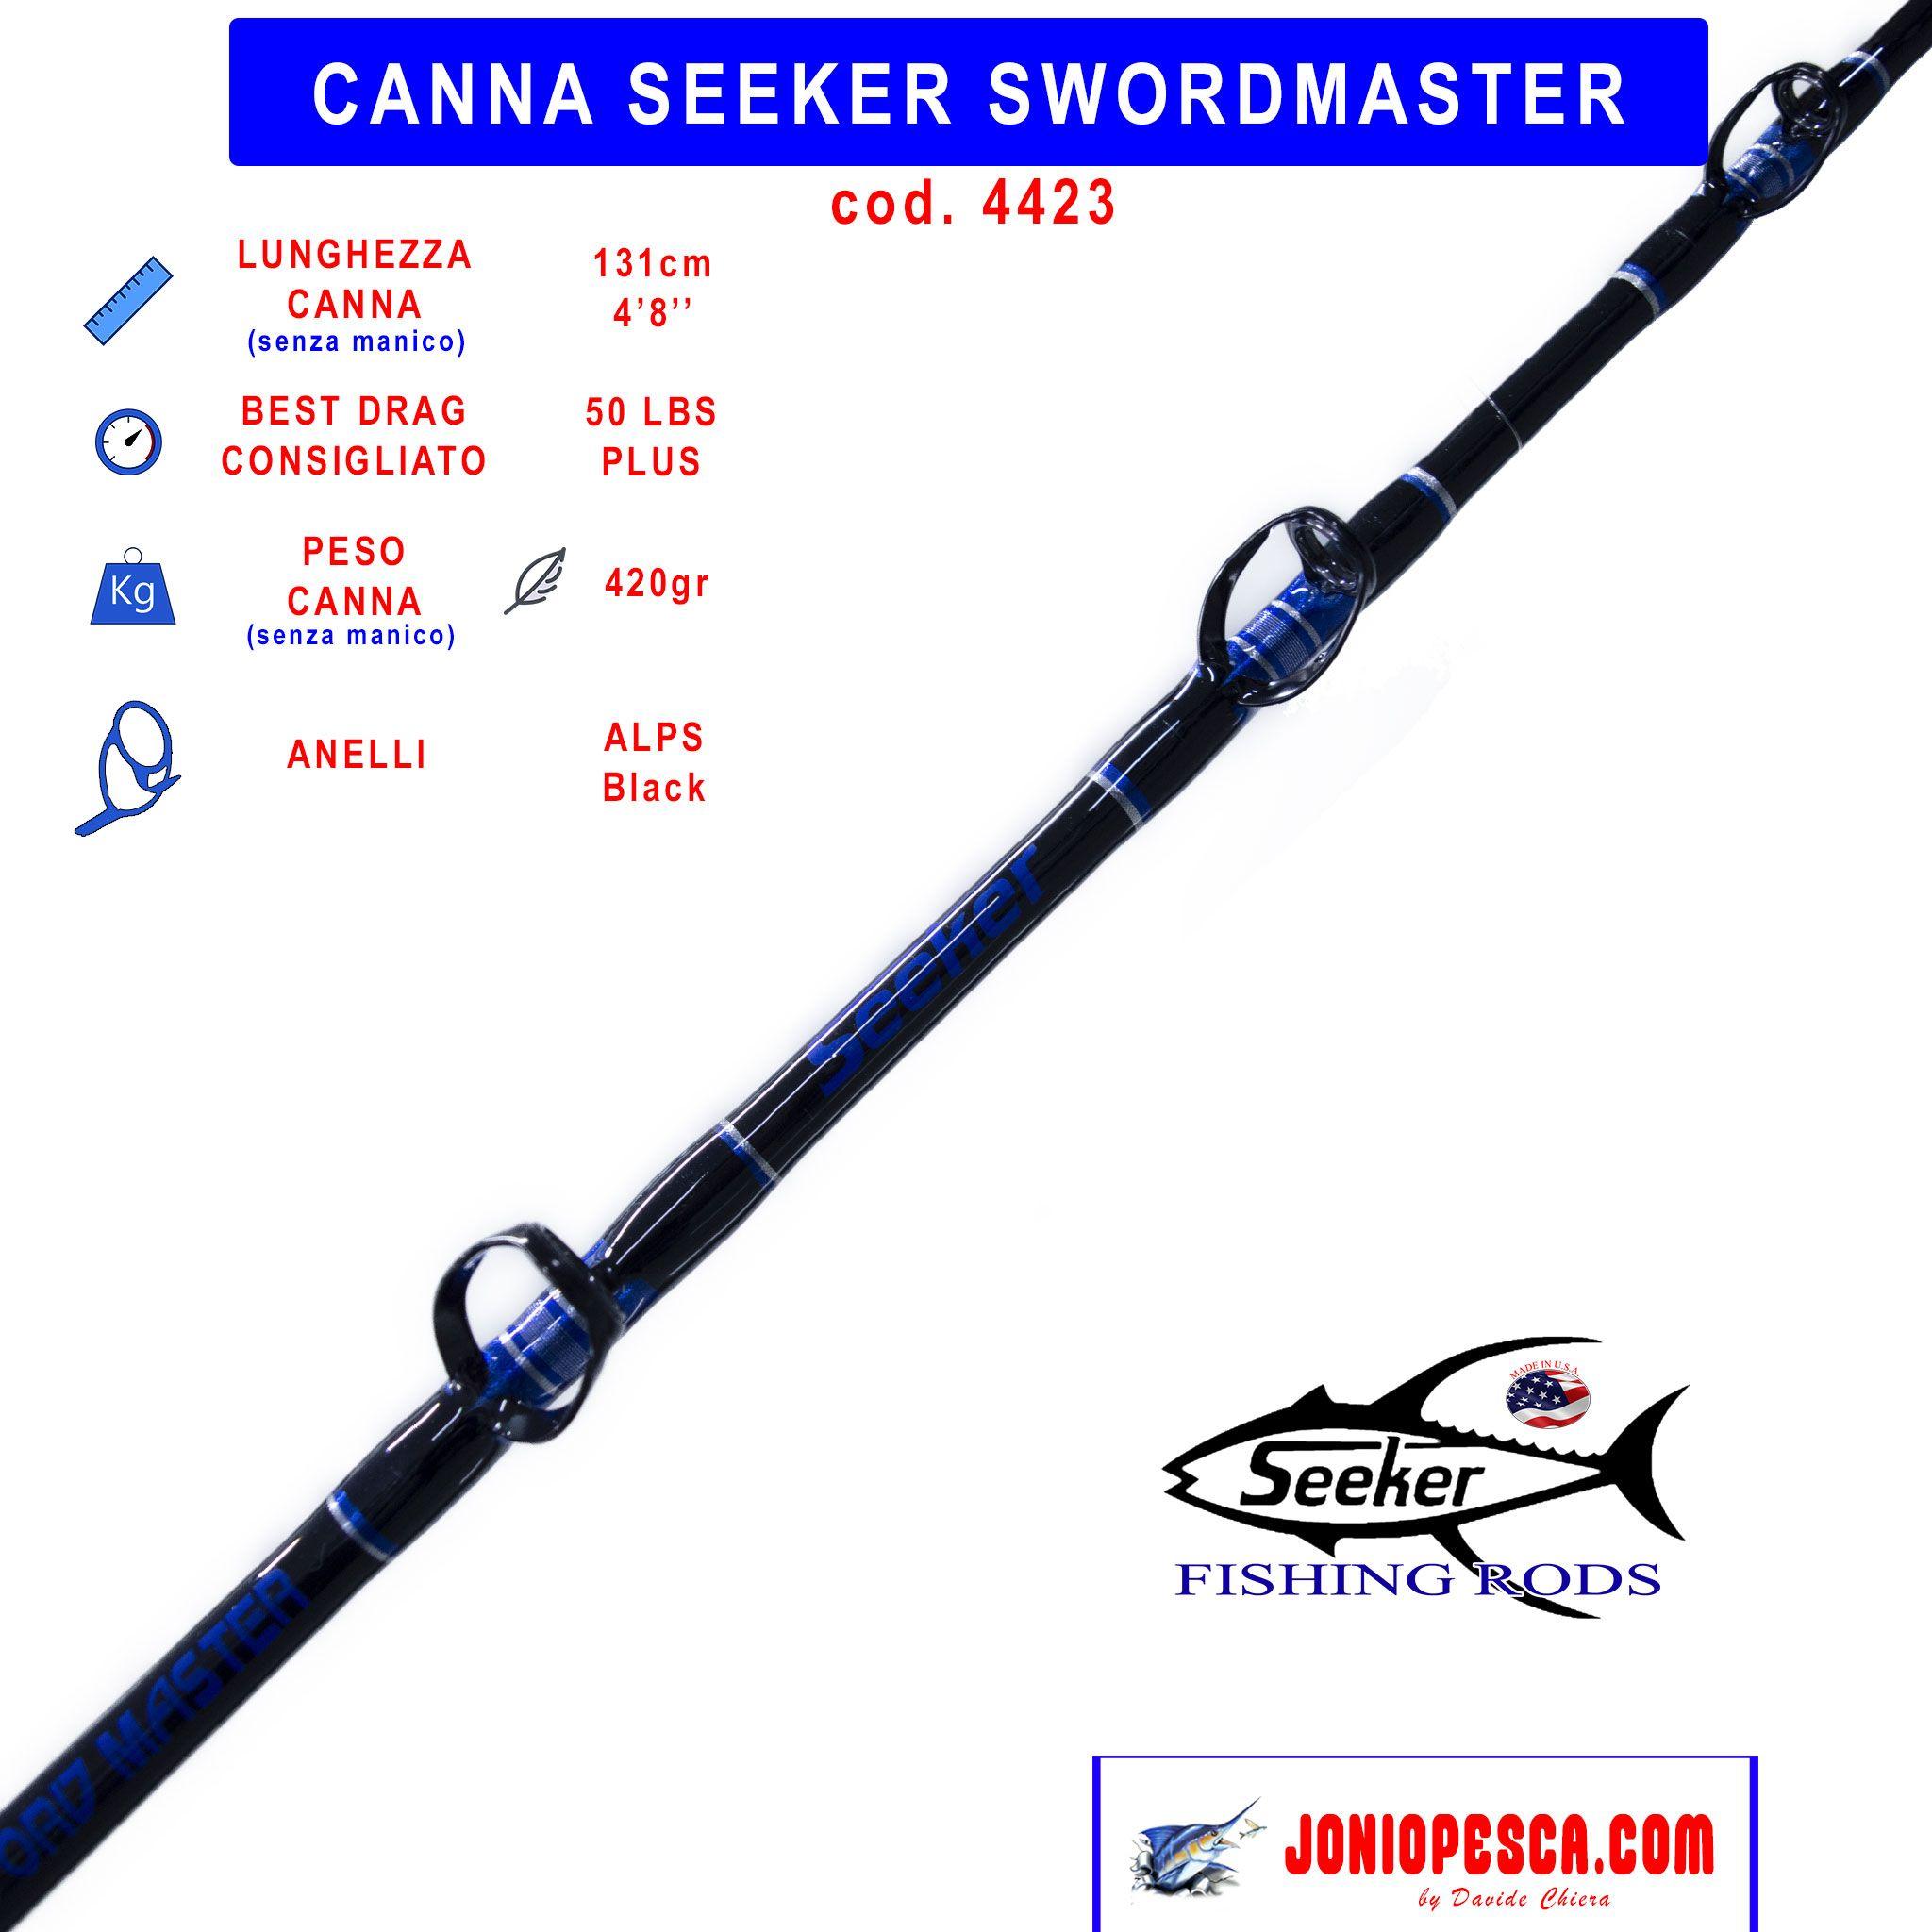 canna-seeker-swordmaster-4423-7